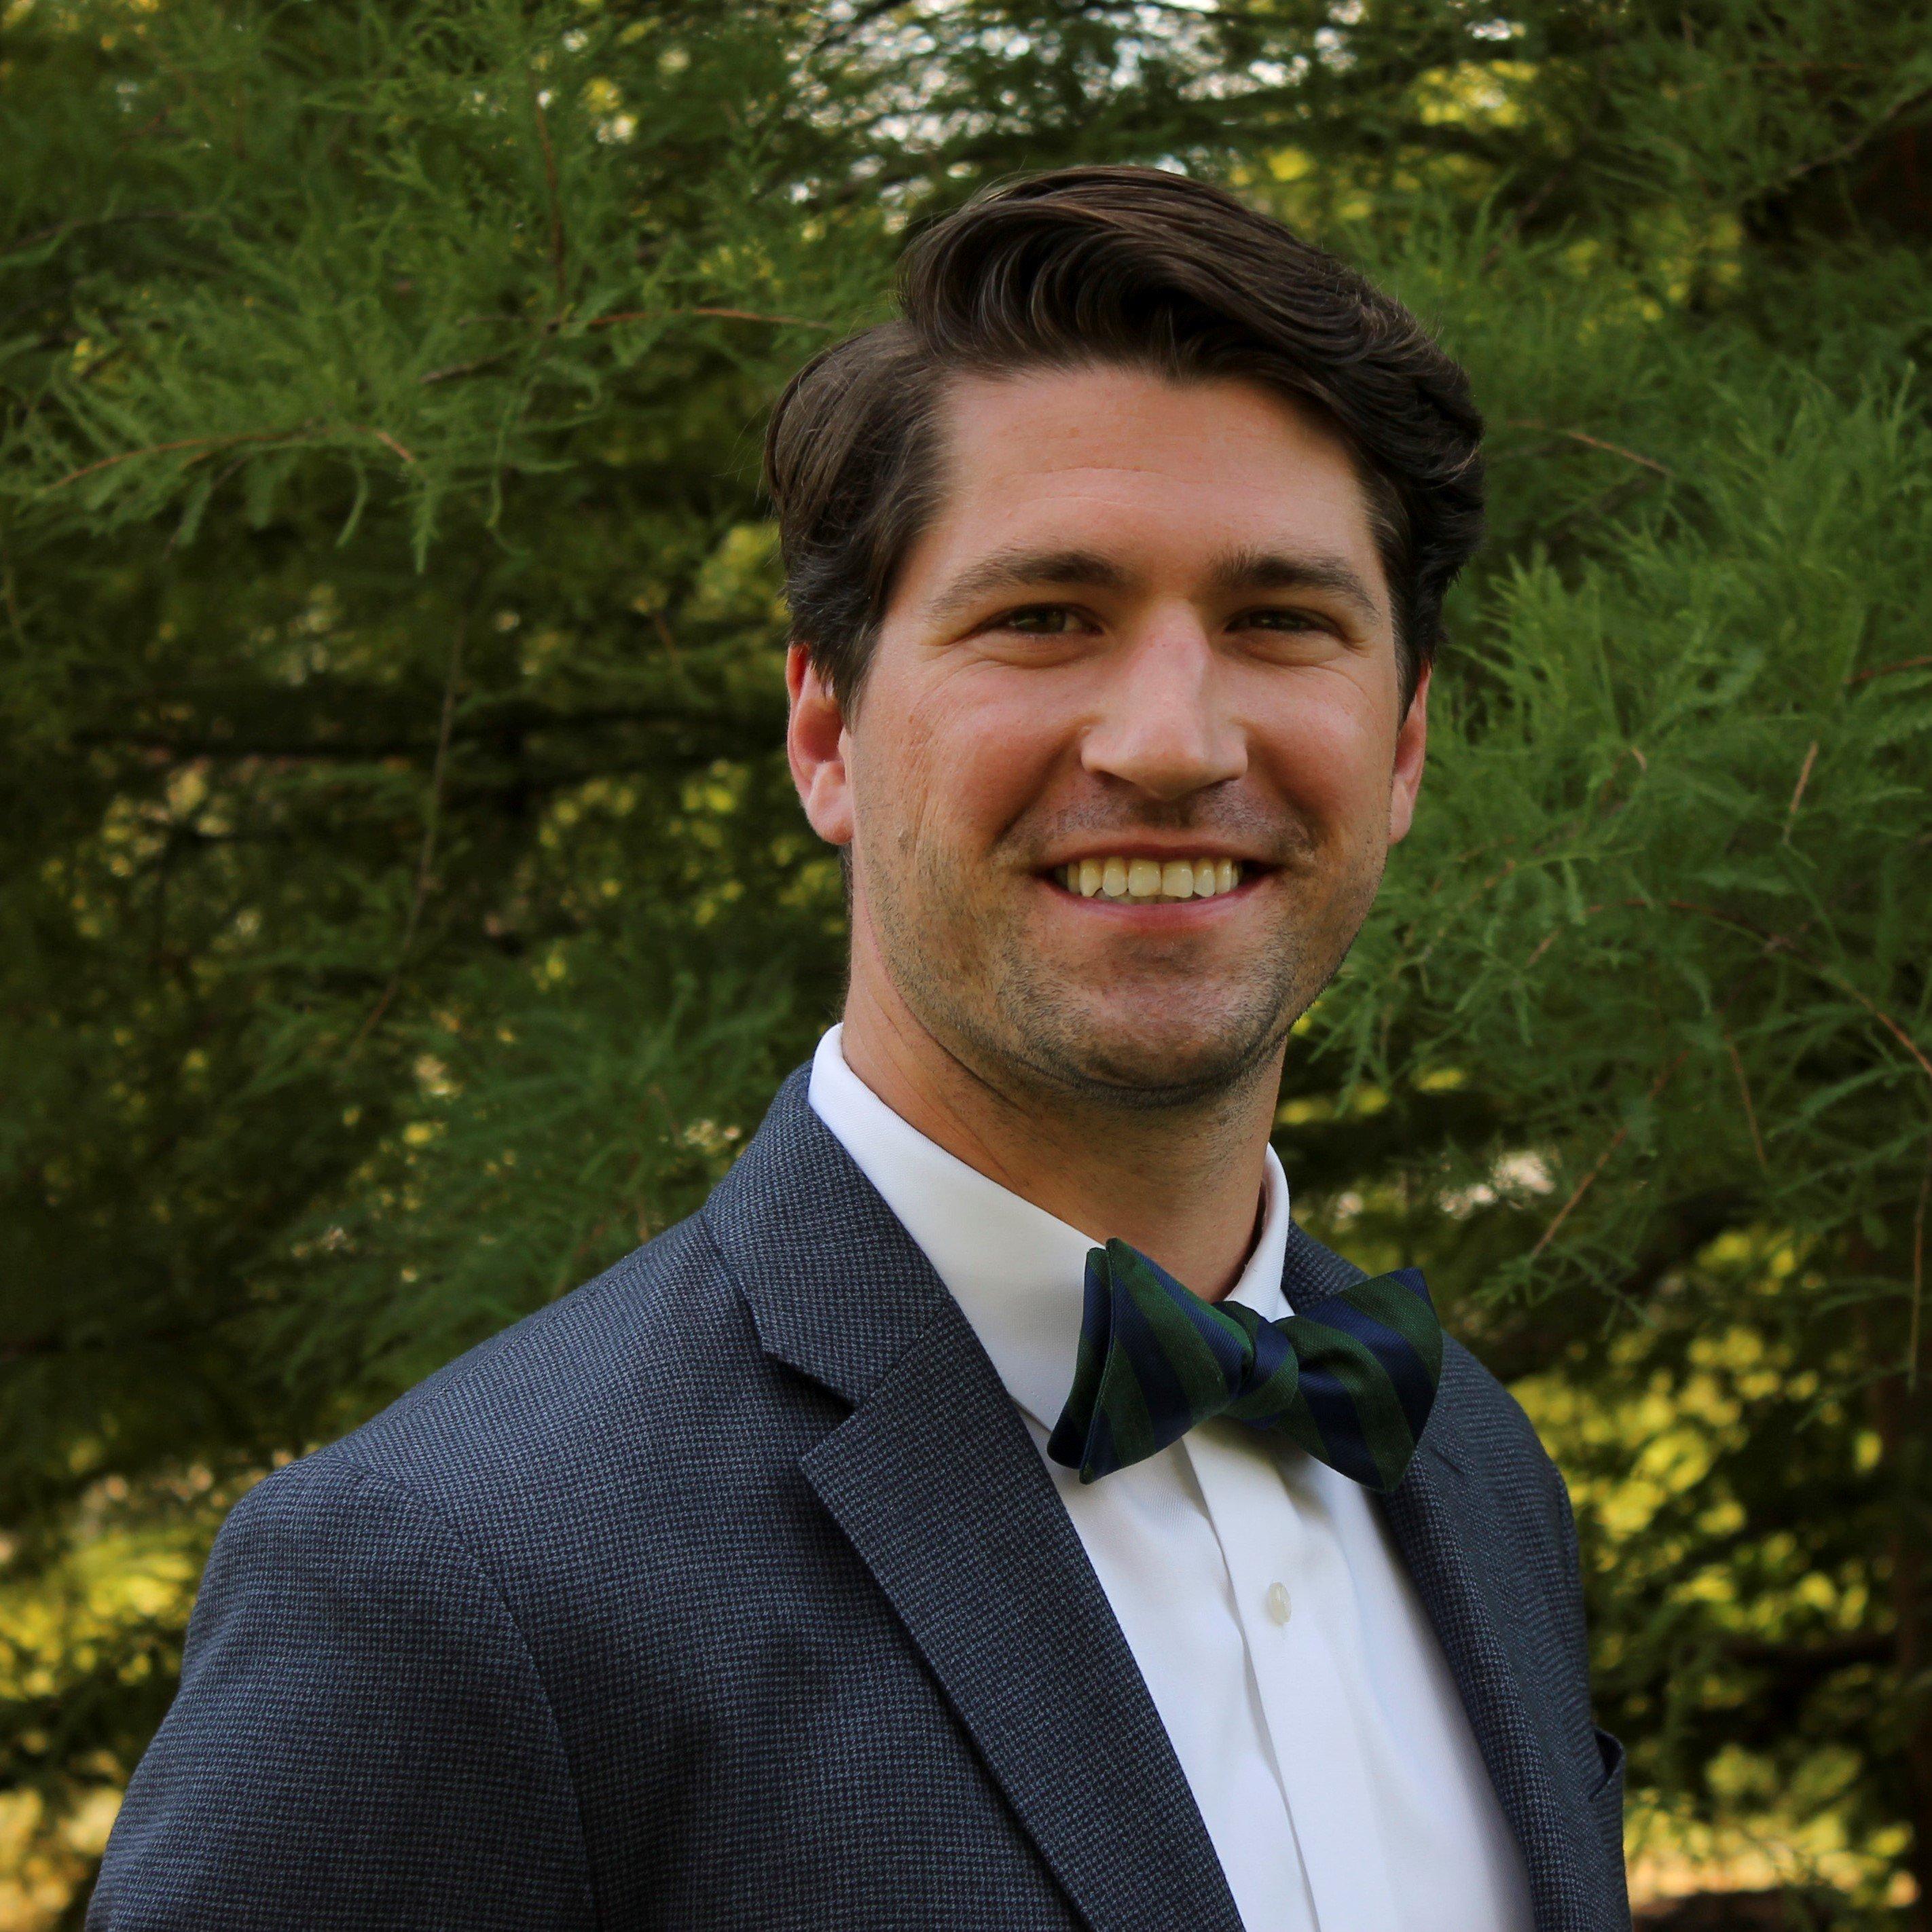 Brian Kelly, Class Six and Greek teacher at Clapham School in Wheaton, IL